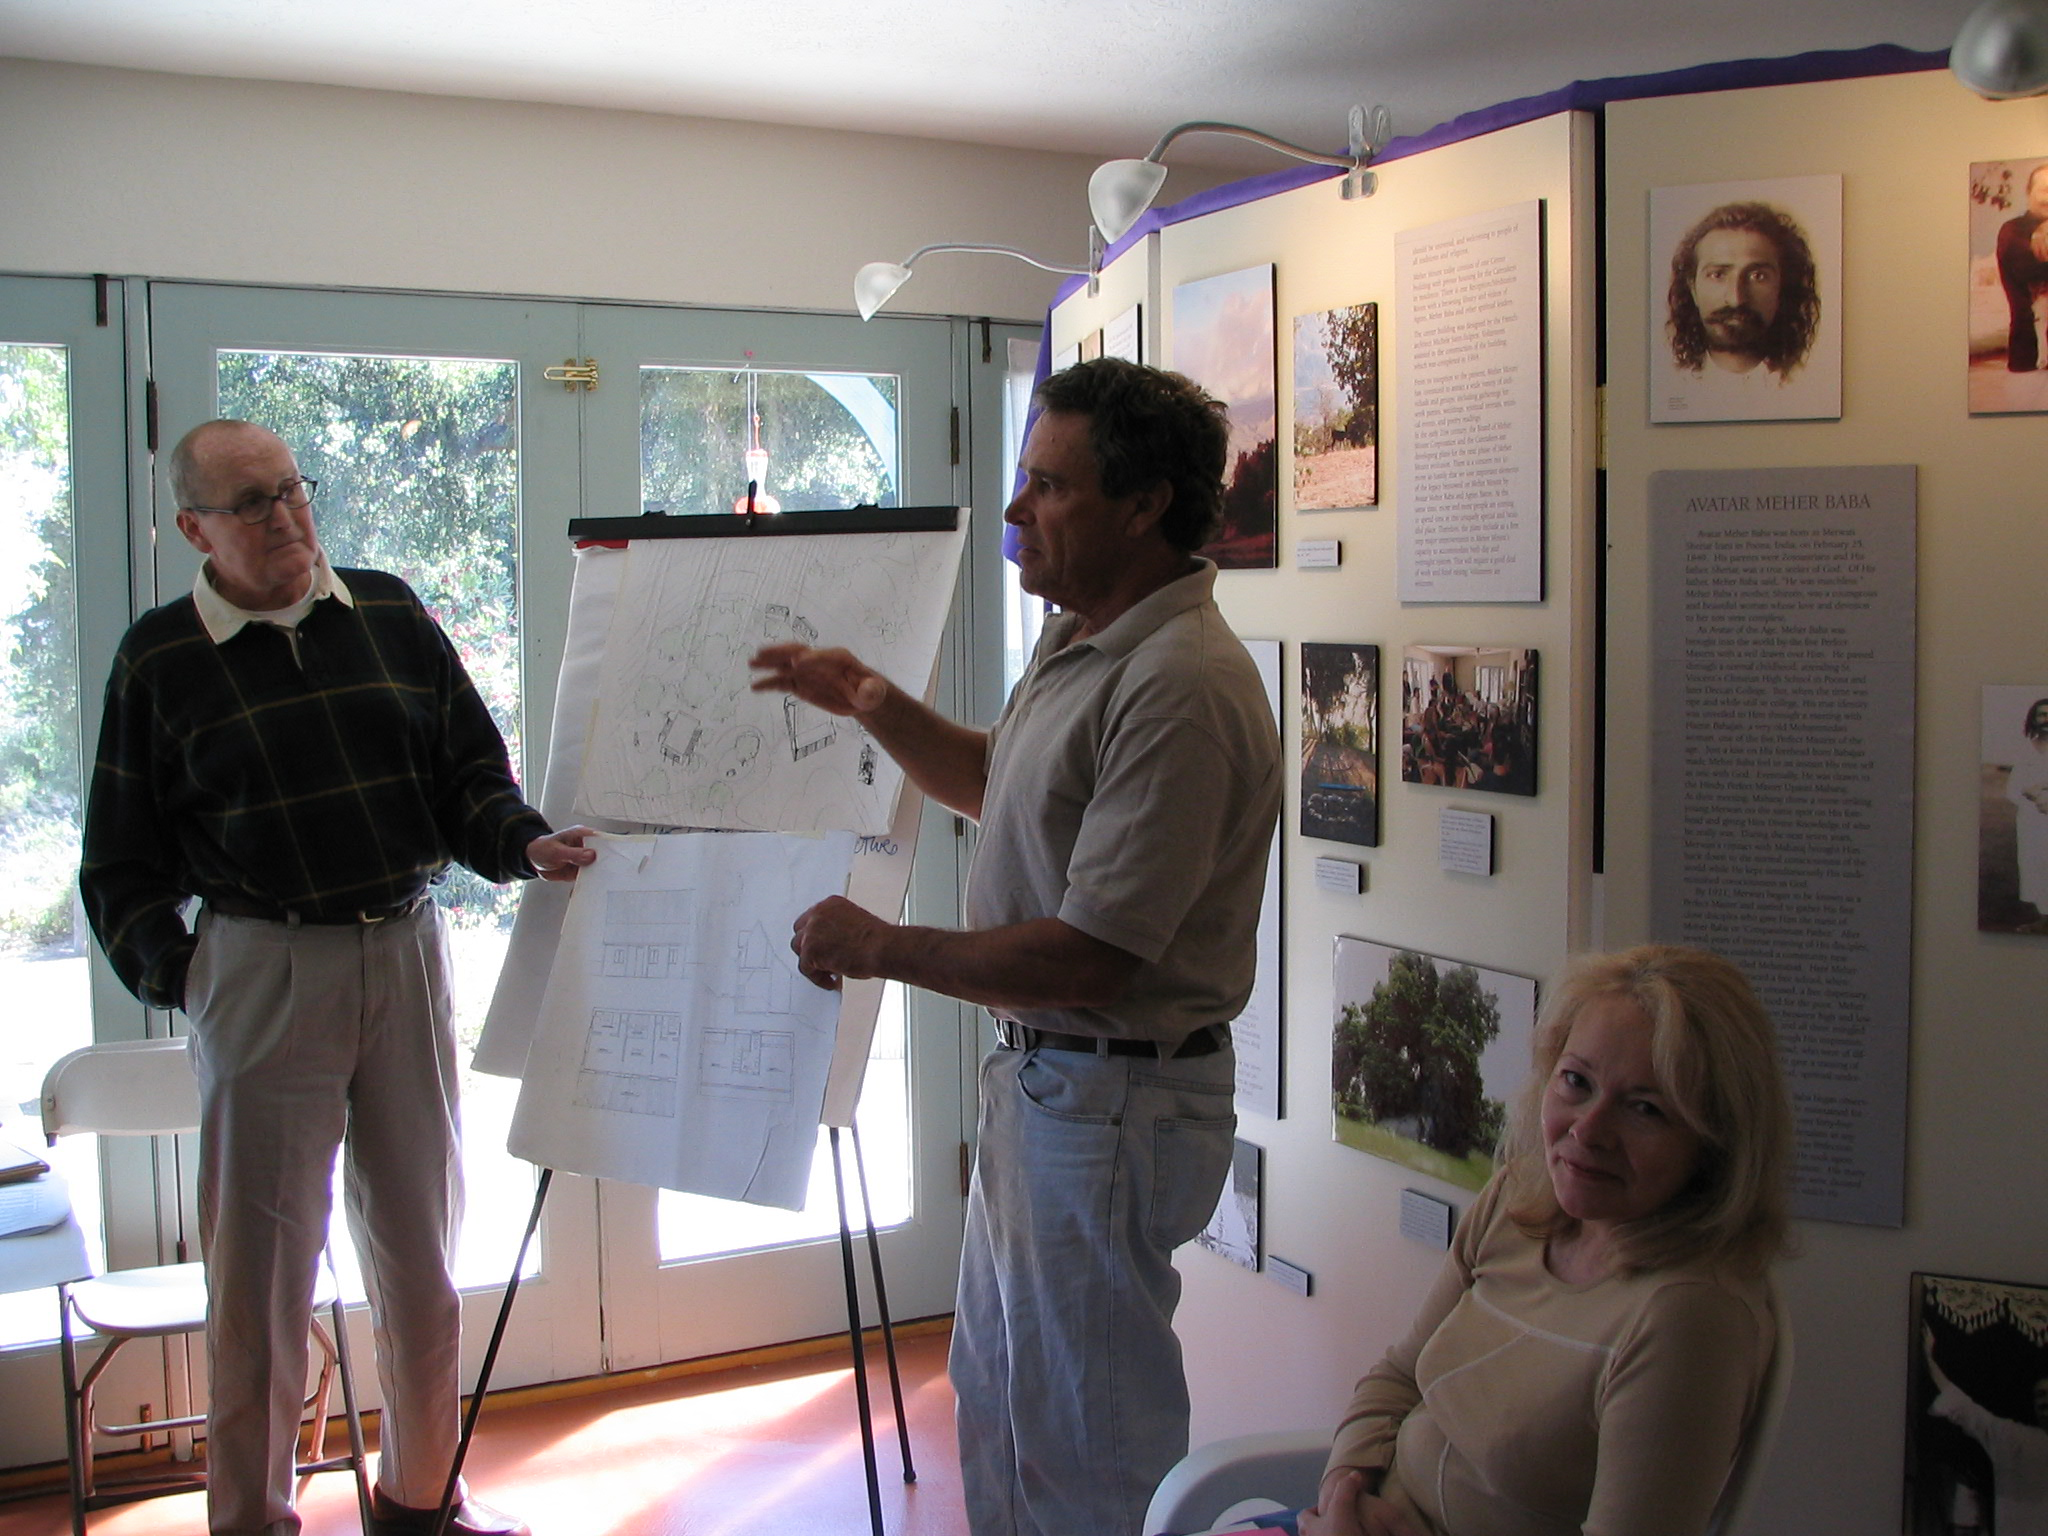 GATHERING PRELIMINARY IDEAS in 2004 with Tom Dortch, Jim Auster and Deborah Dortch. (Photo: Sam Ervin)